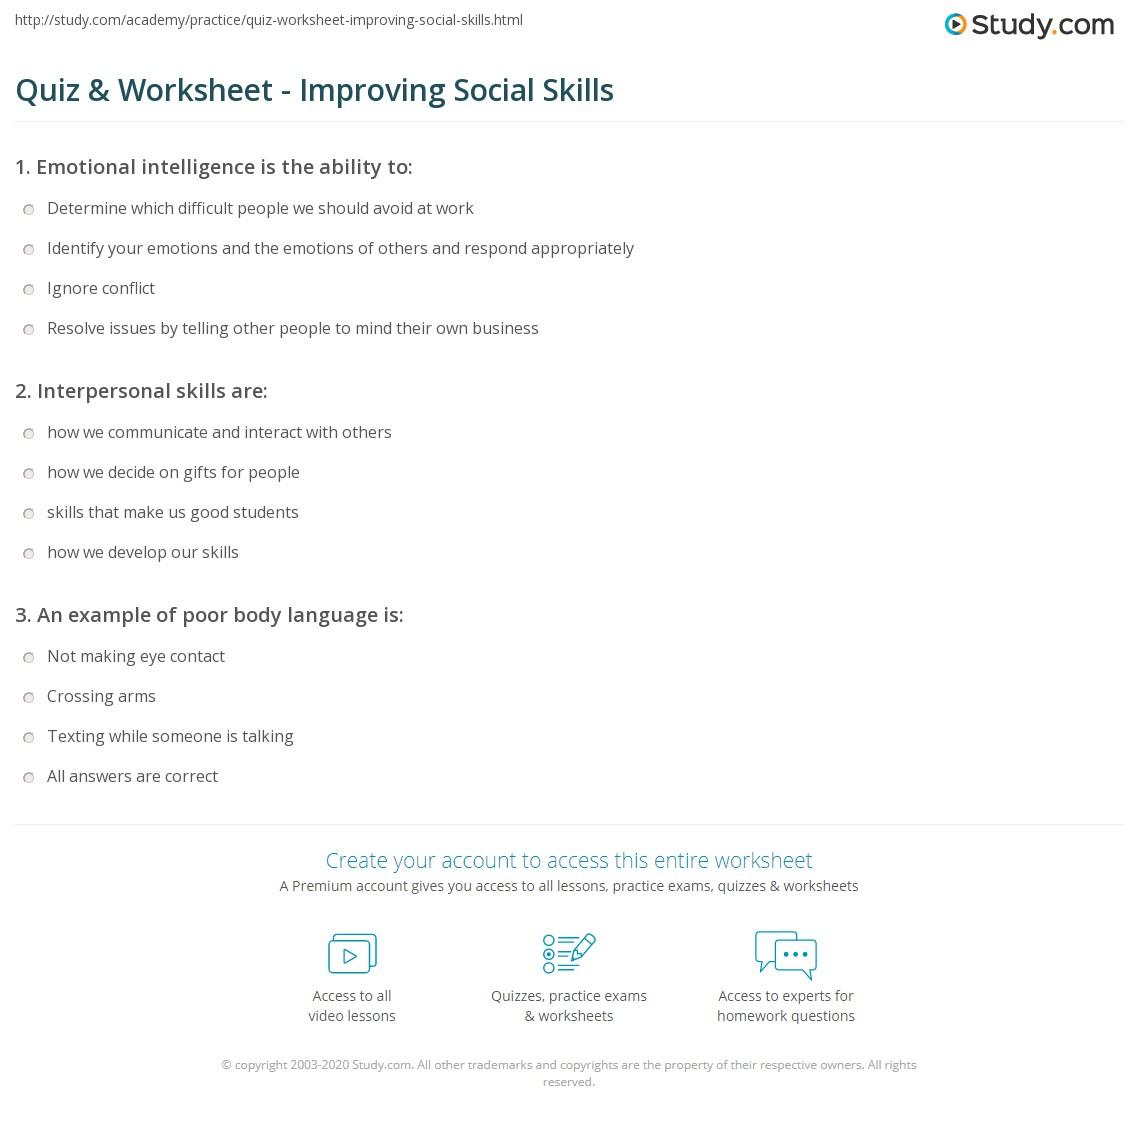 - Quiz & Worksheet - Improving Social Skills Study.com